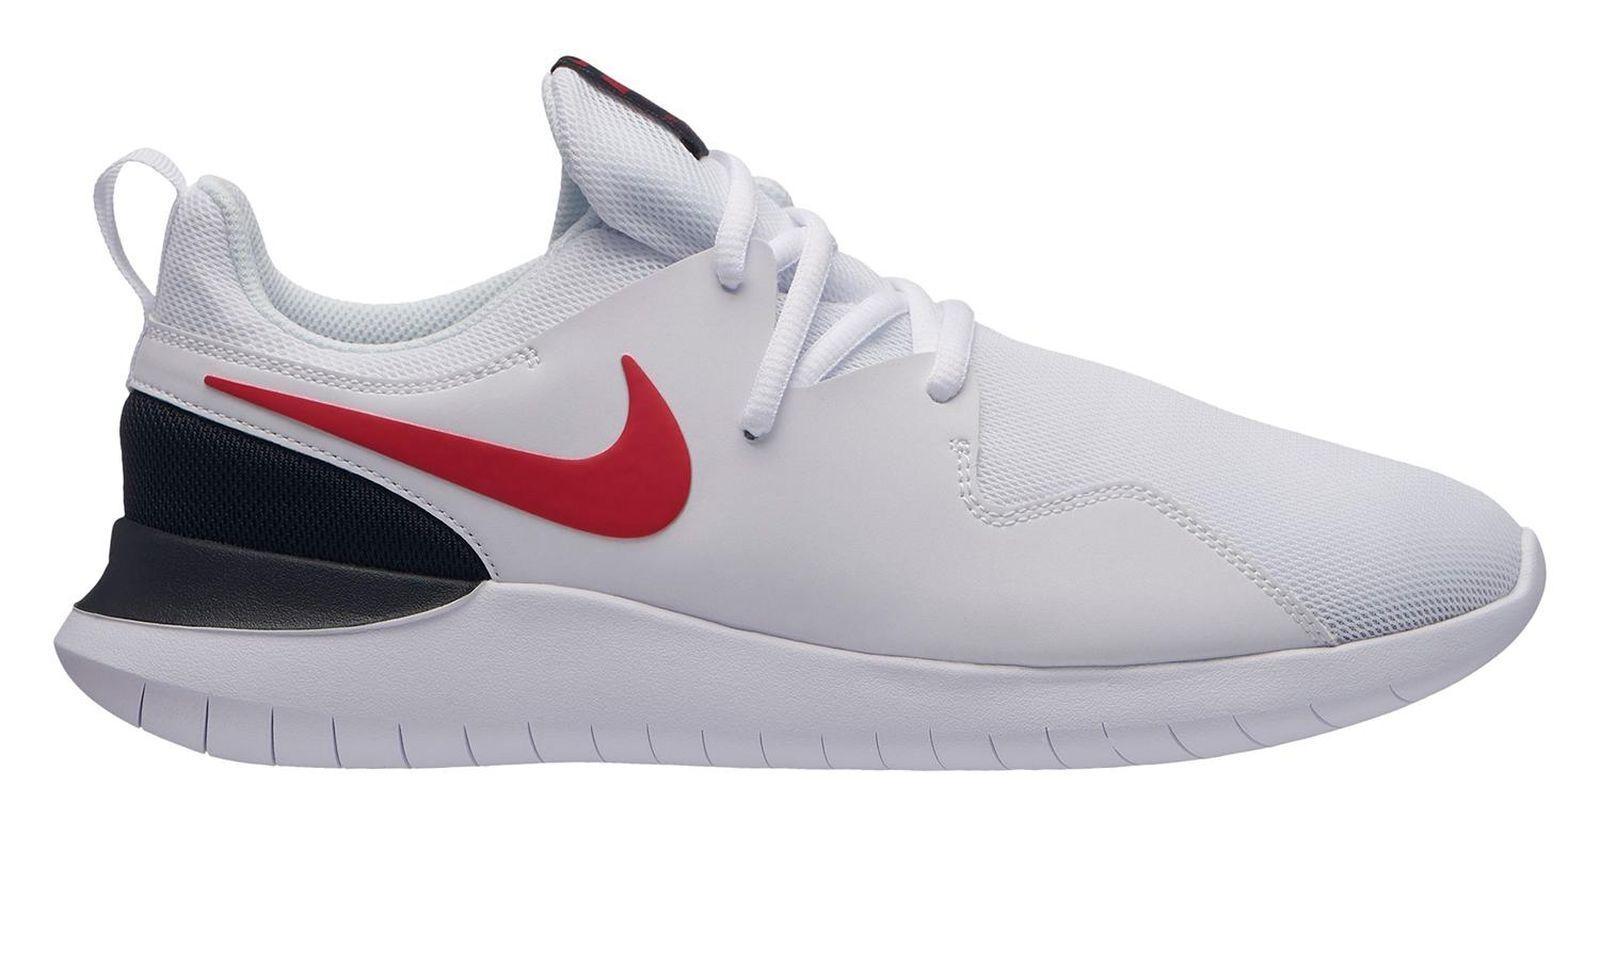 Nike Uomo Scarpe per Tempo Libero Nike Tessen Bianco